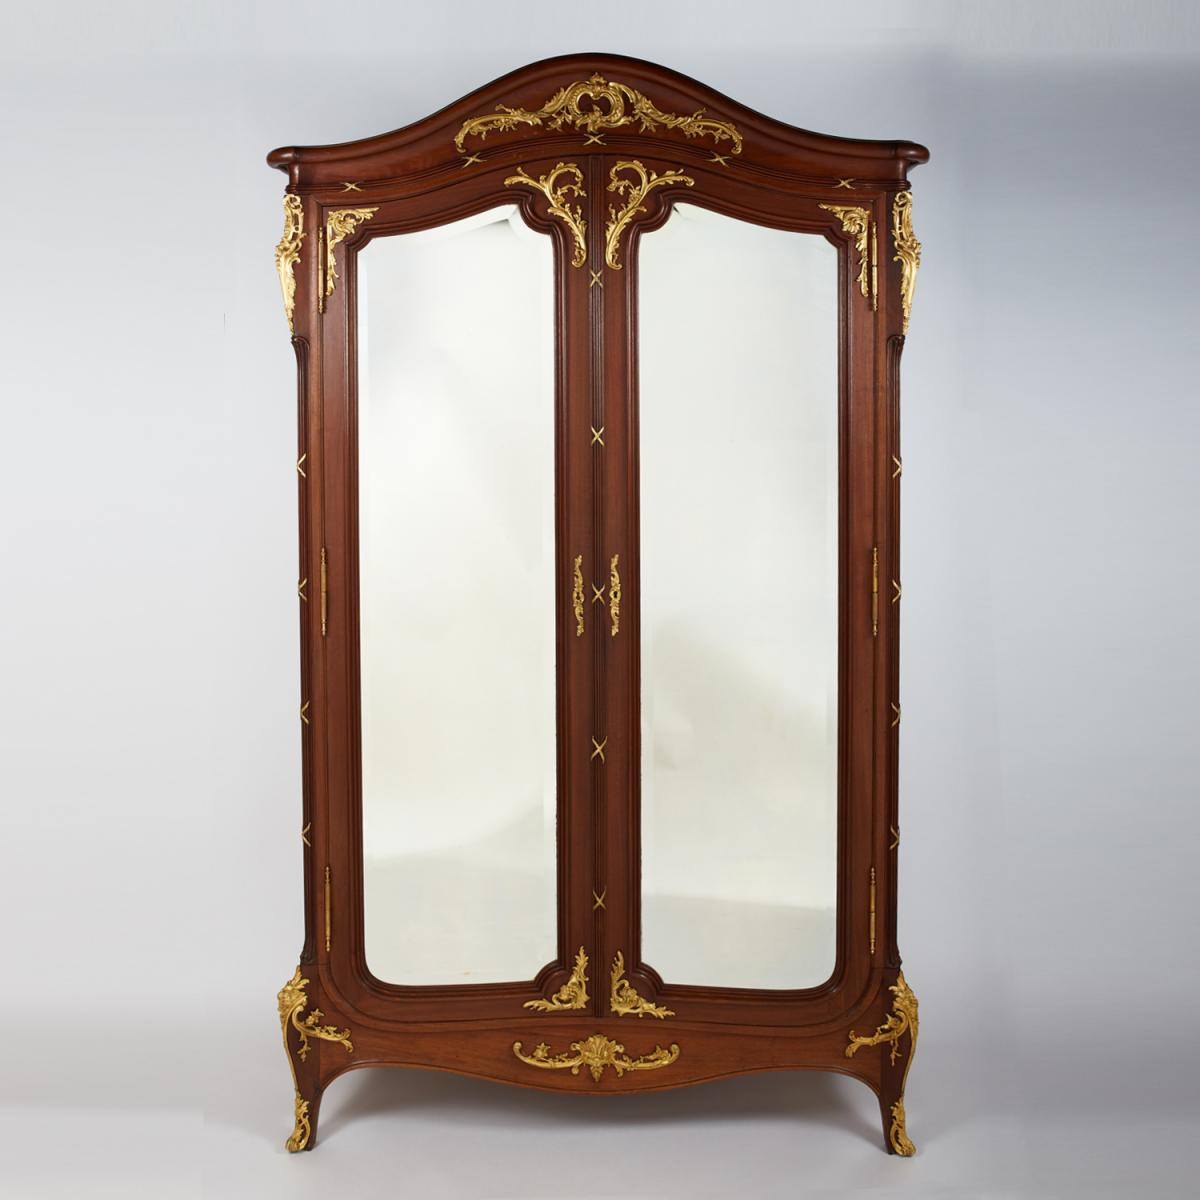 Chambre de style Louis XV, XIXe